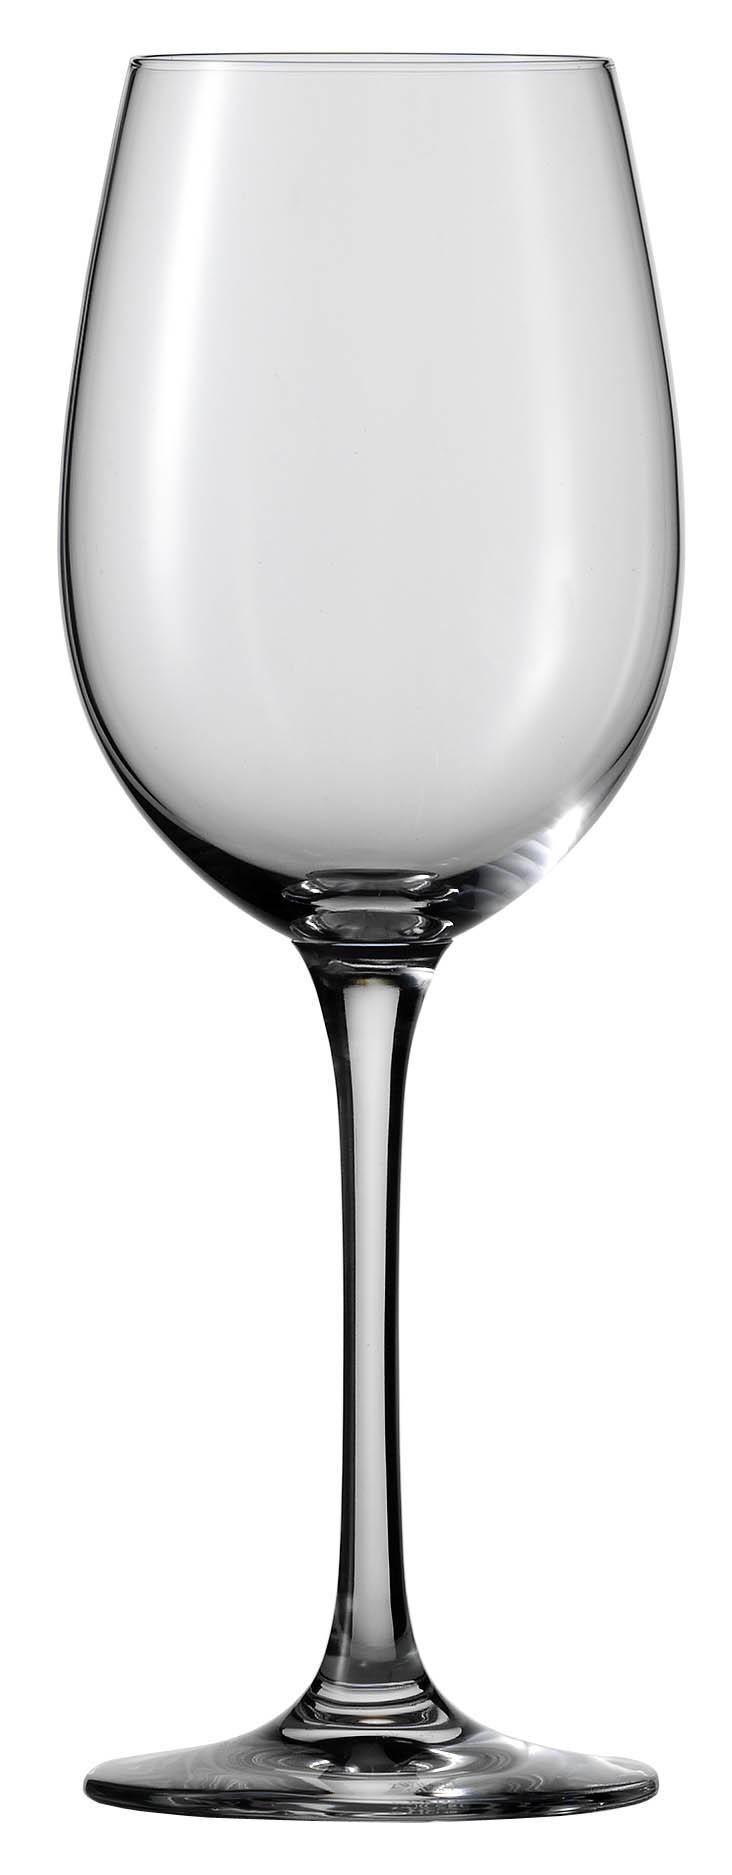 BURGUNDERGLAS - Klar, Basics, Glas (0,408l) - SCHOTT ZWIESEL